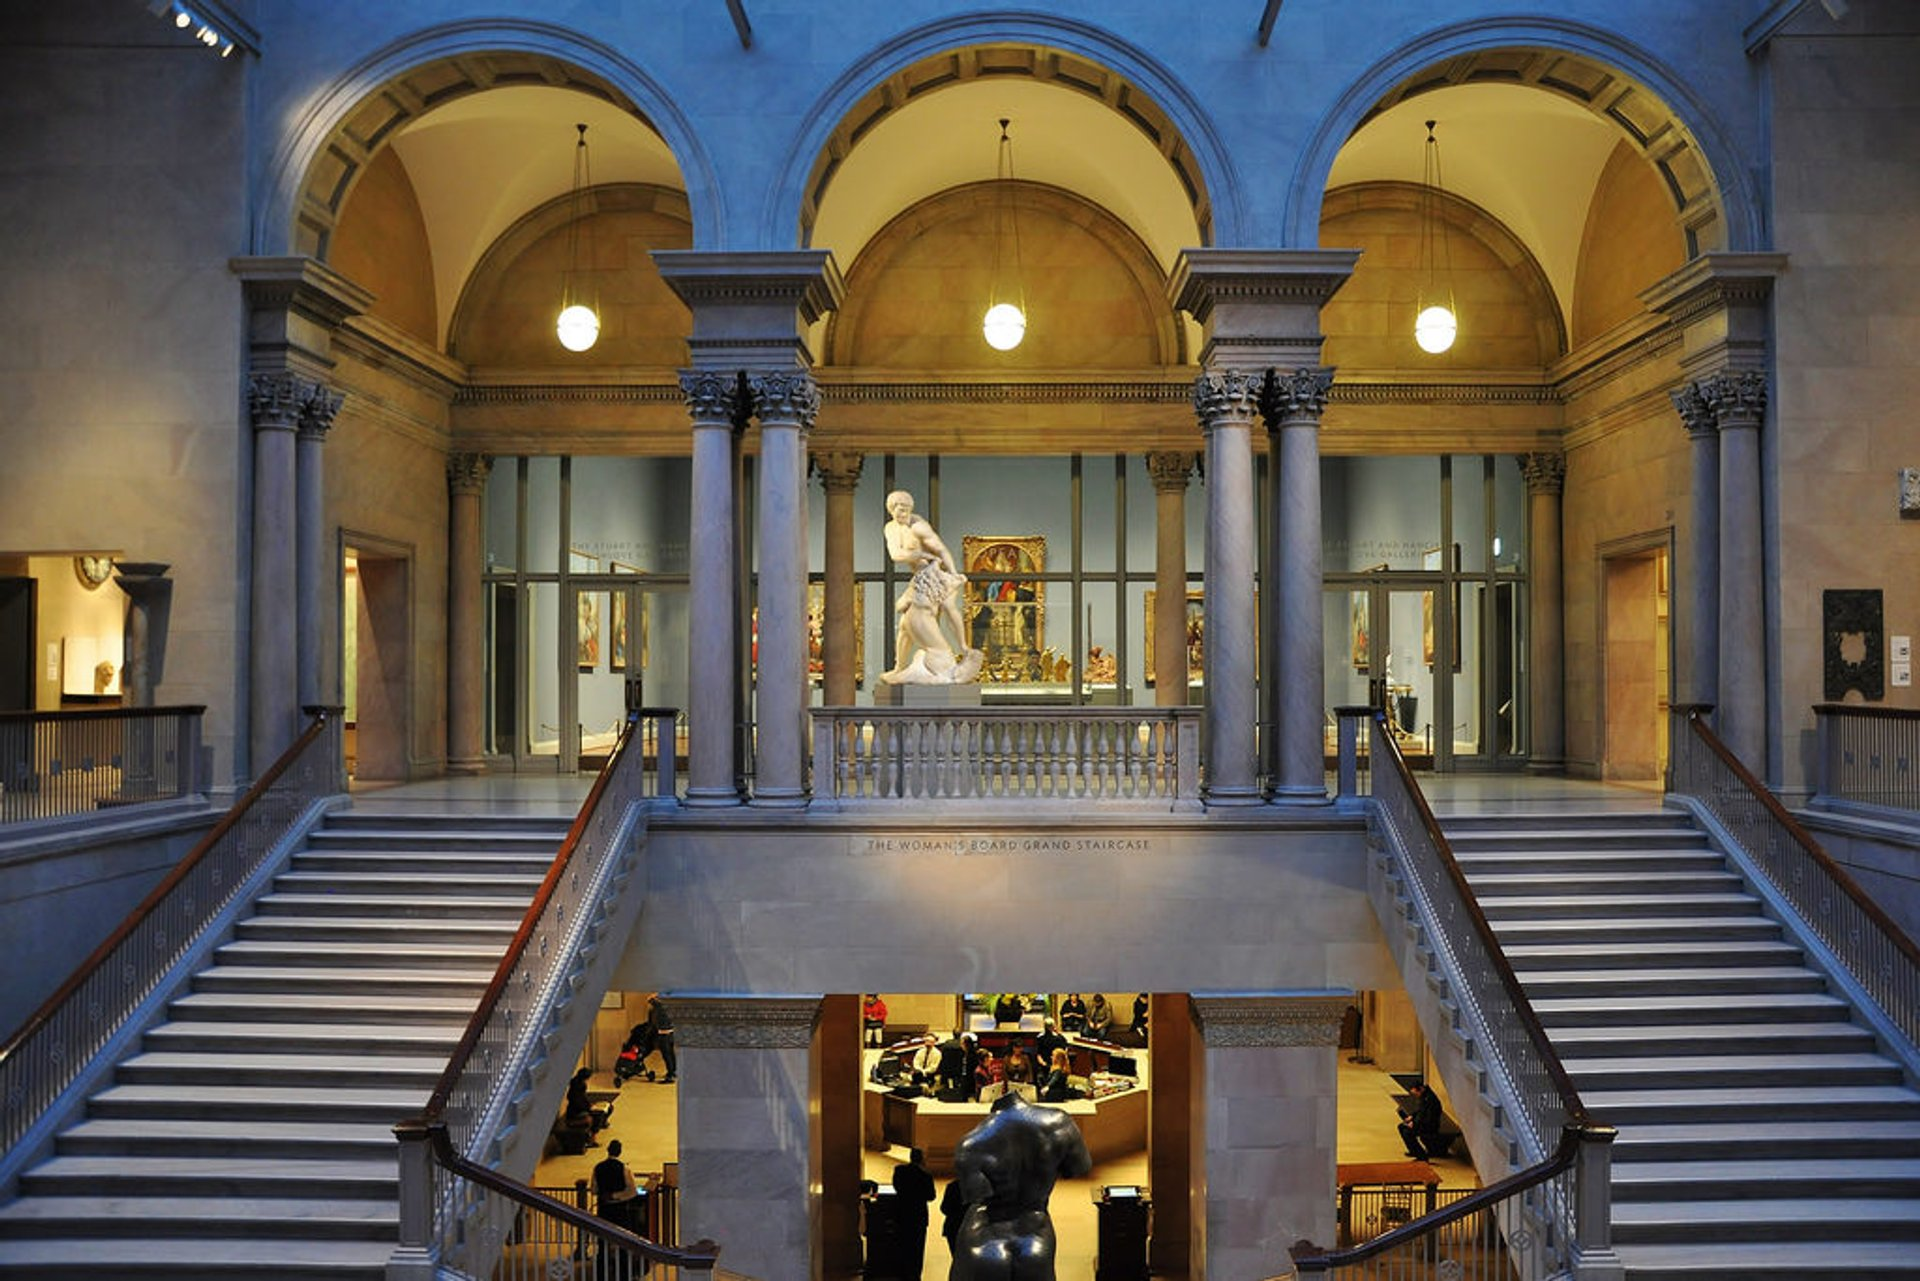 The beautiful Art Institute of Chicago 2019